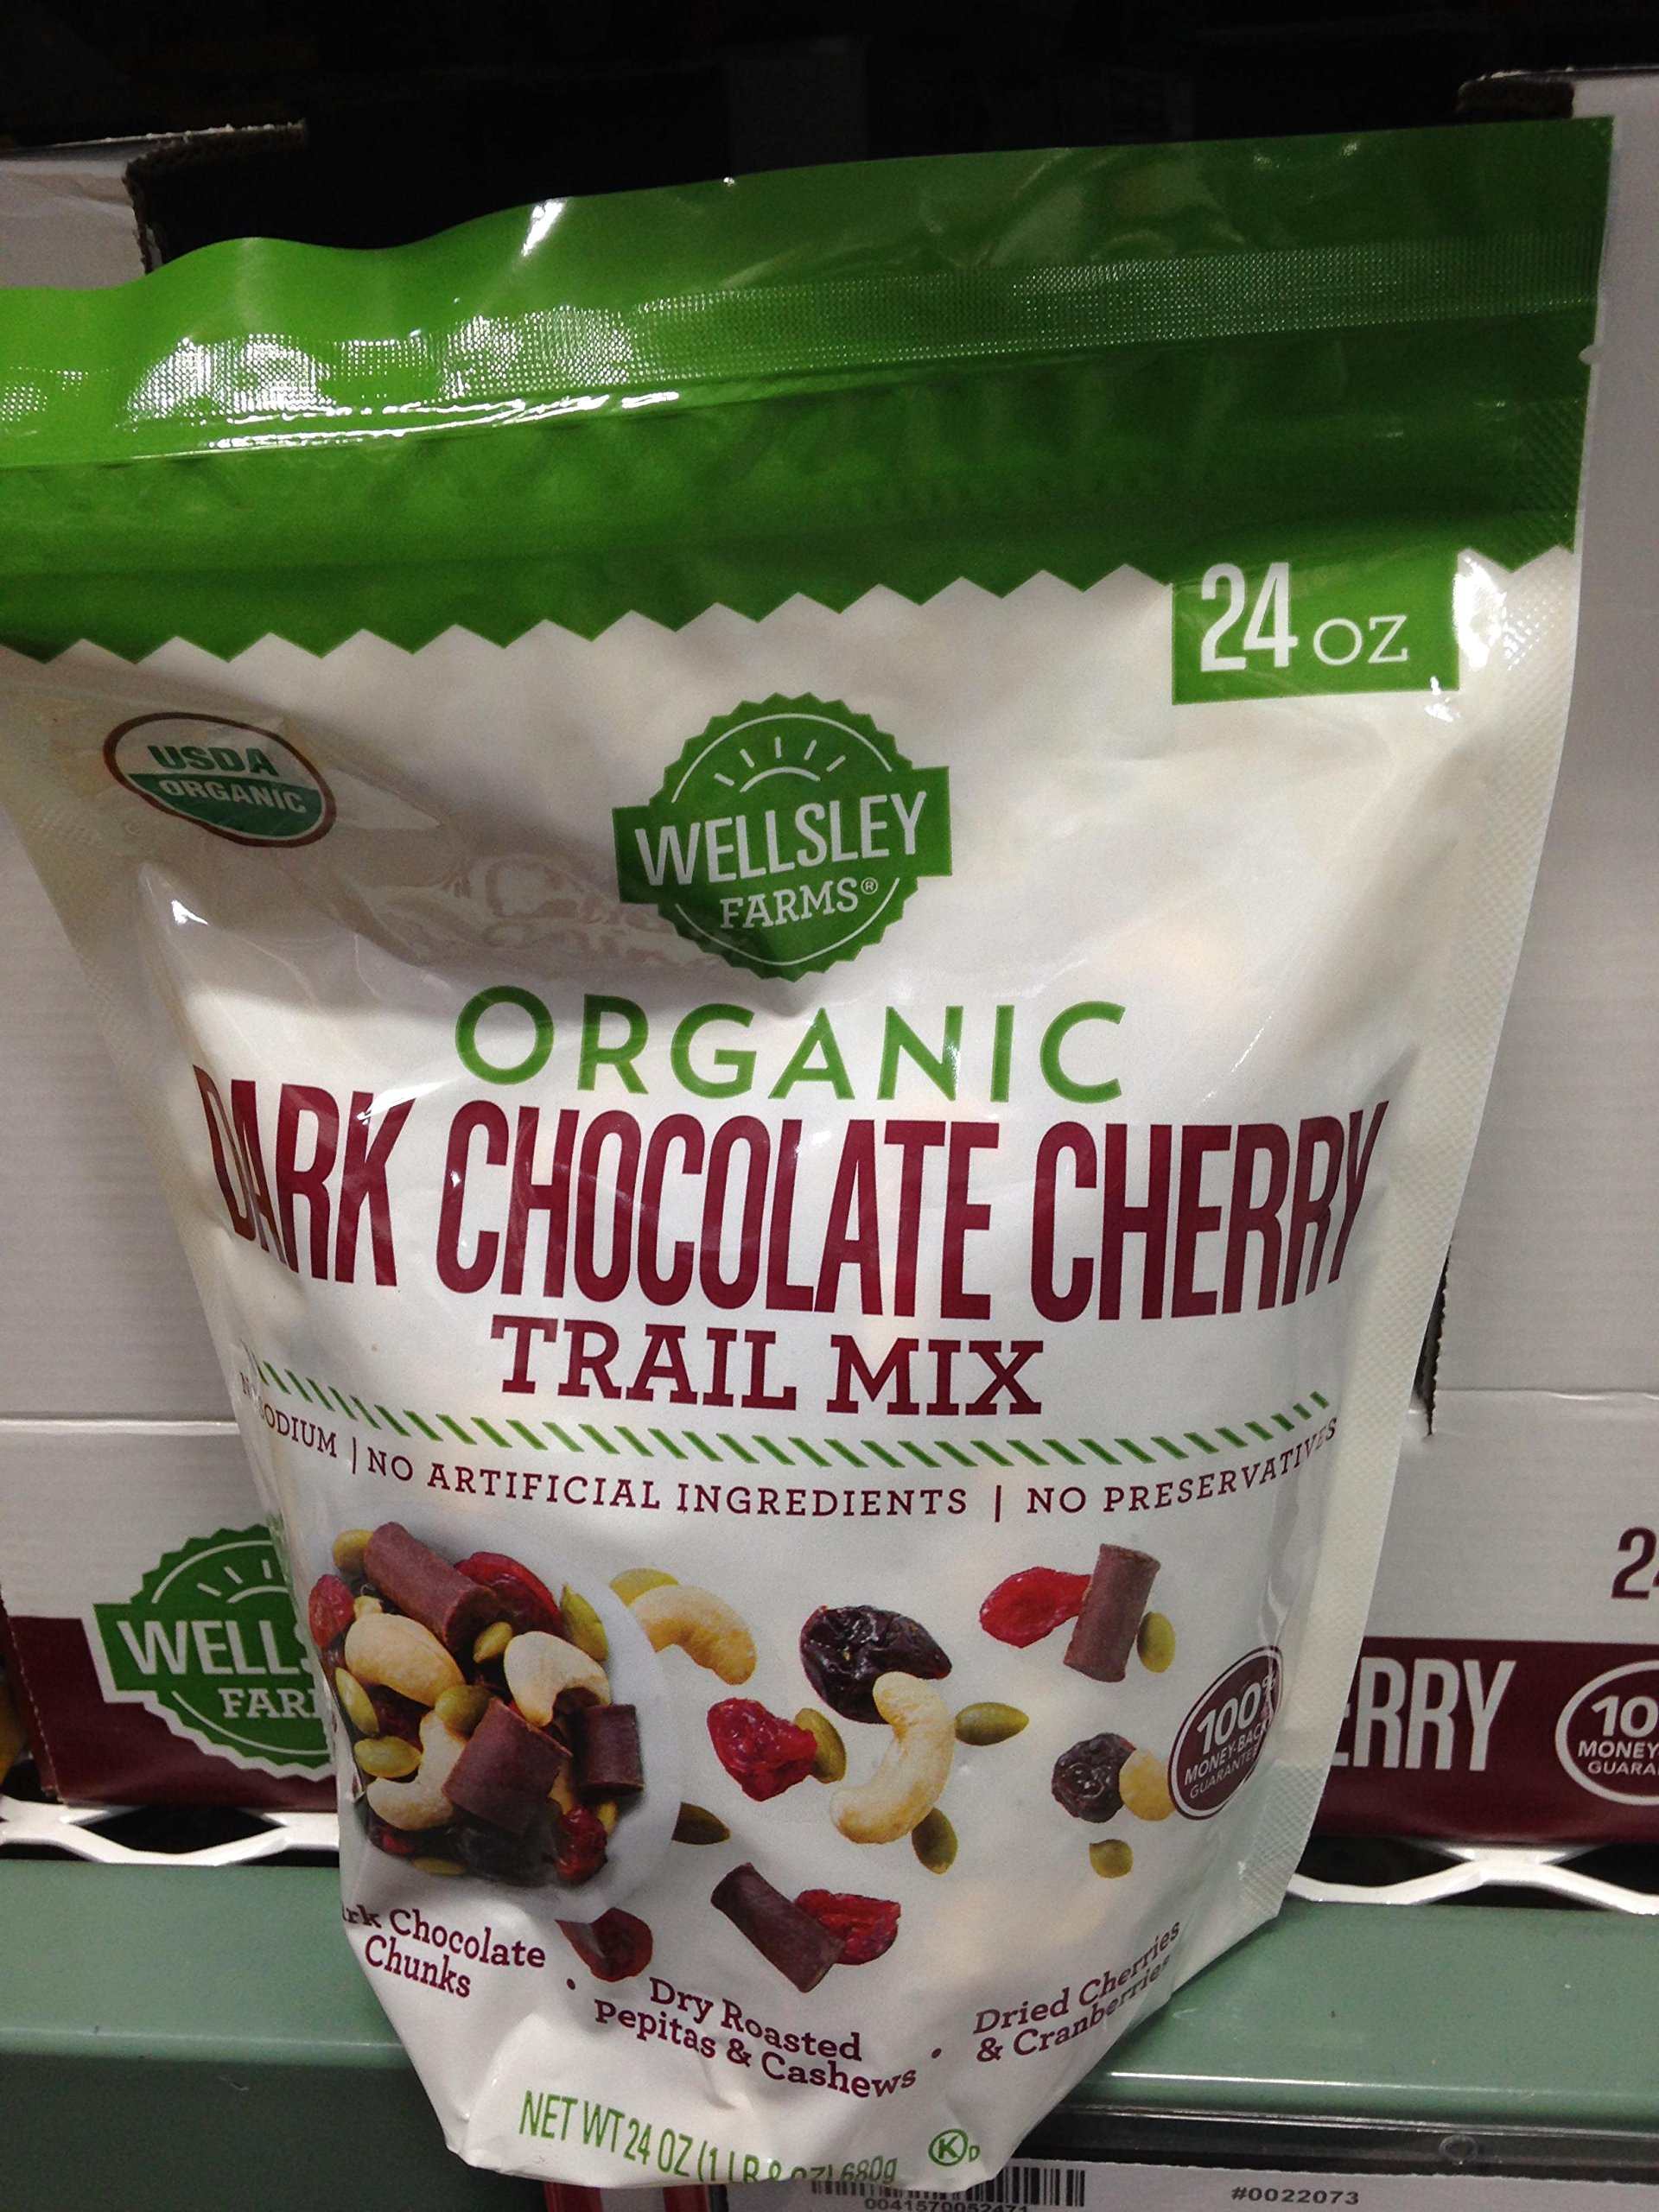 Wellsley Farms Organic Dark Chocolate Cherry Trail Mix, 24 oz. (pack of 6)